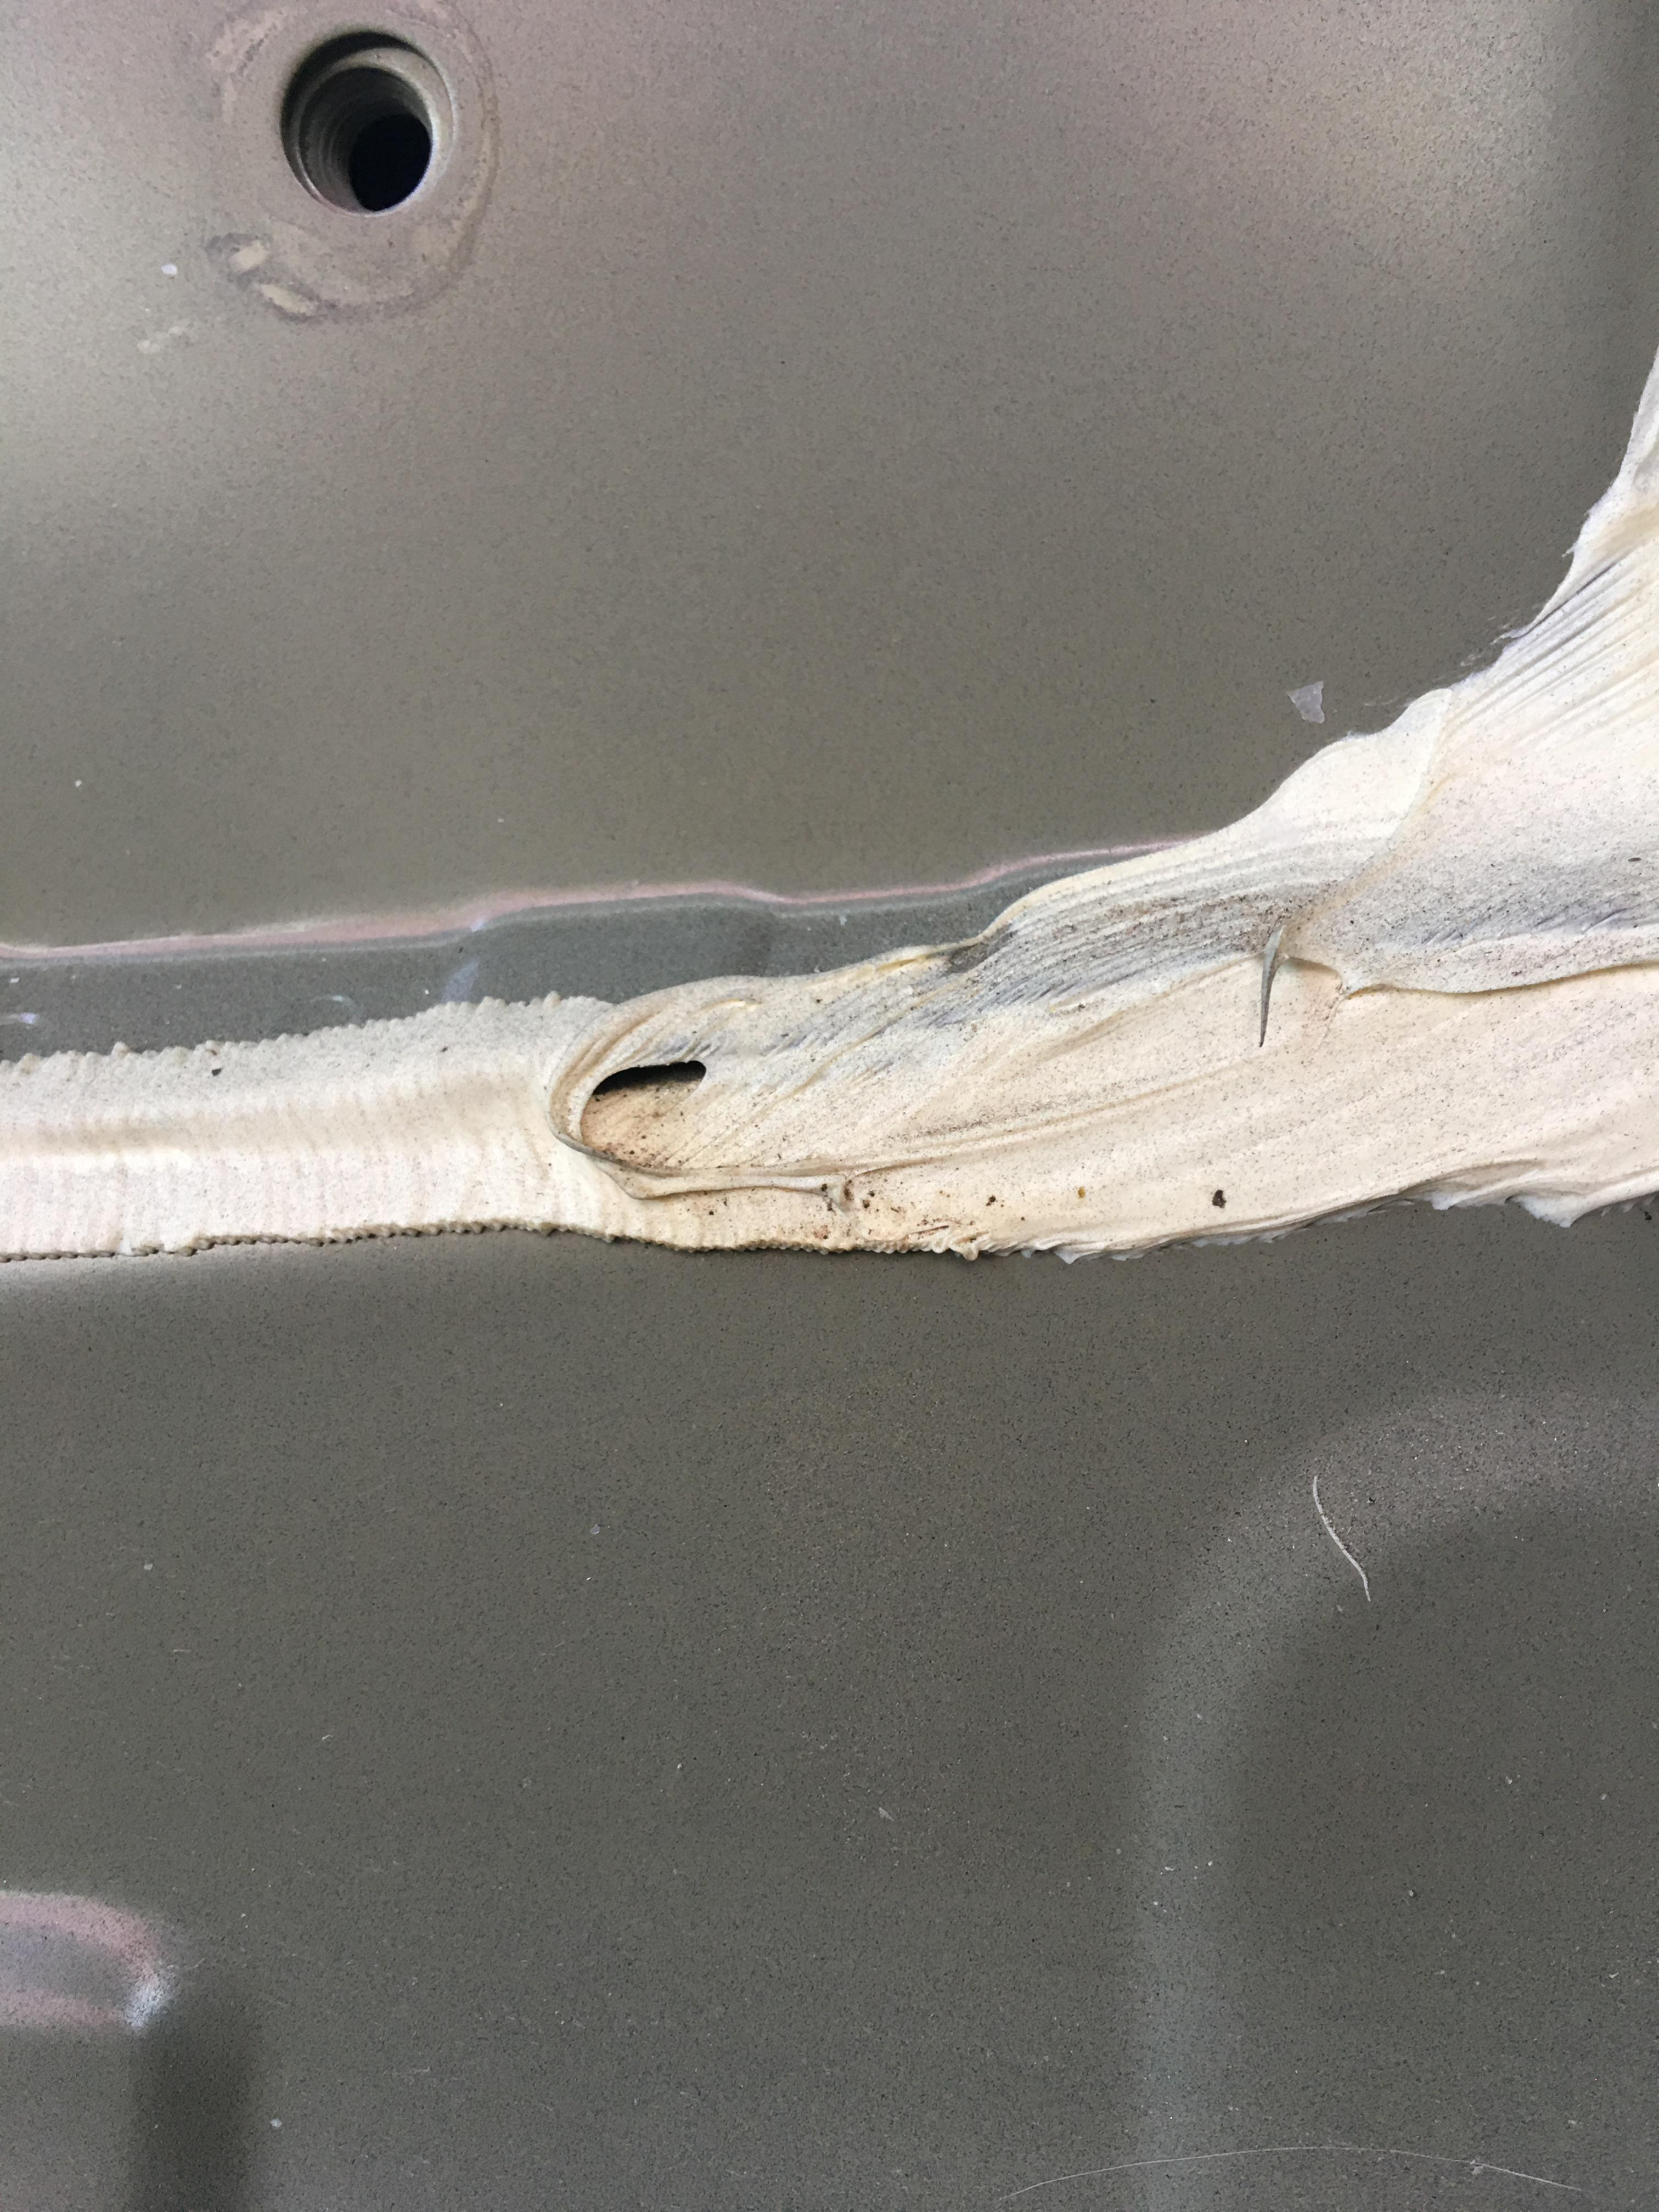 Rear Cargo Hold Floor Pan Seam Seal Water Intrusion-b213728b-f9c8-41f2-82a5-05cca2d0a09b_1555455376868.jpg